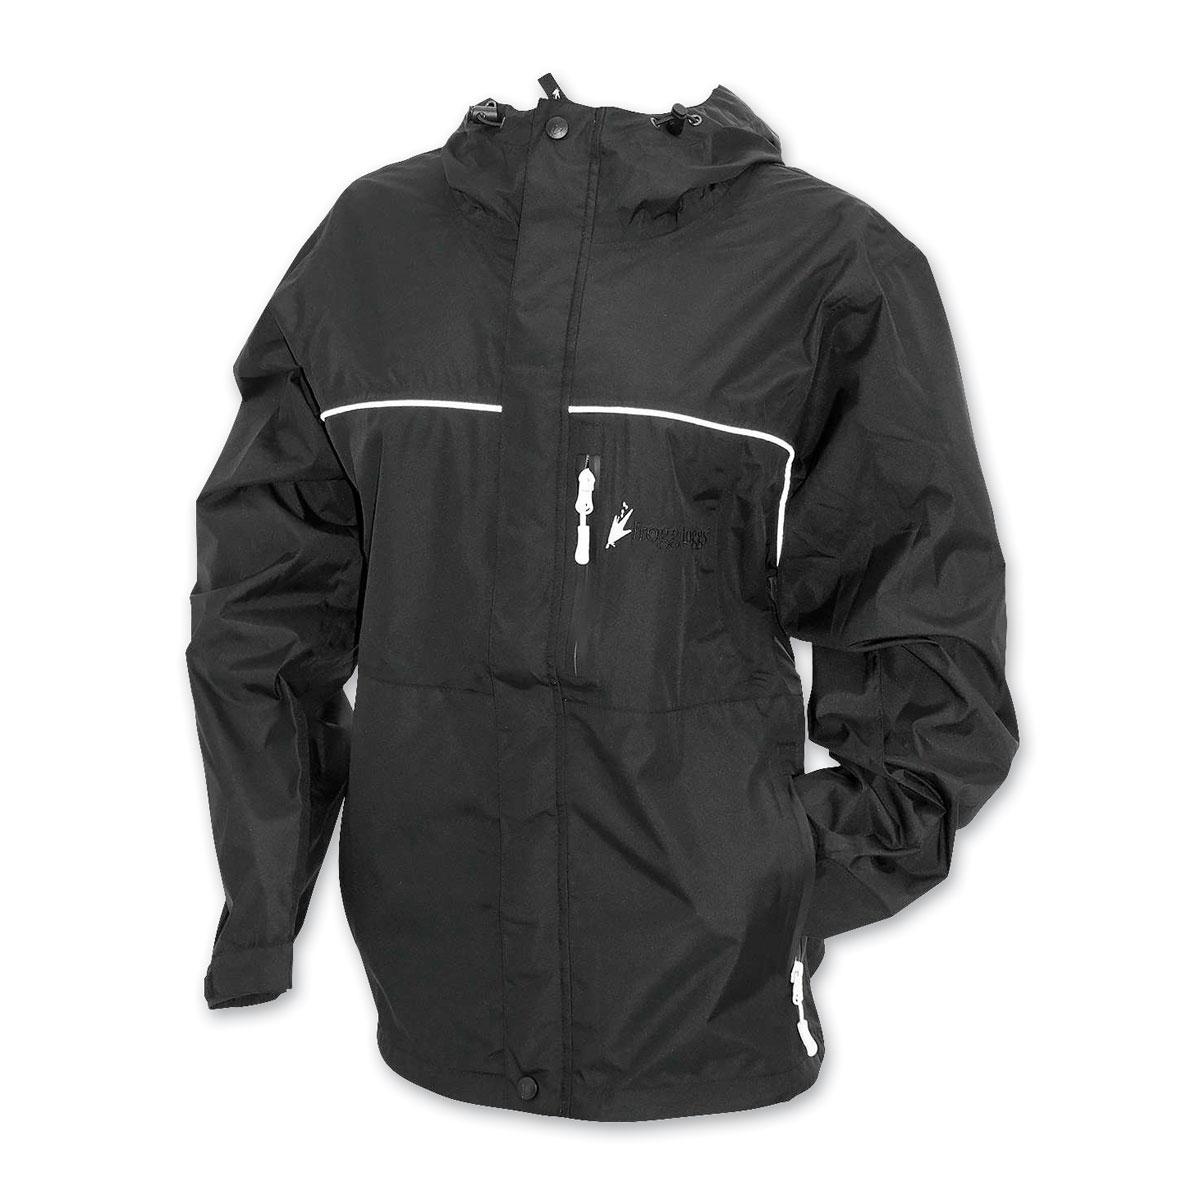 Frogg Toggs Women's Java Toadz Black Rain Jacket